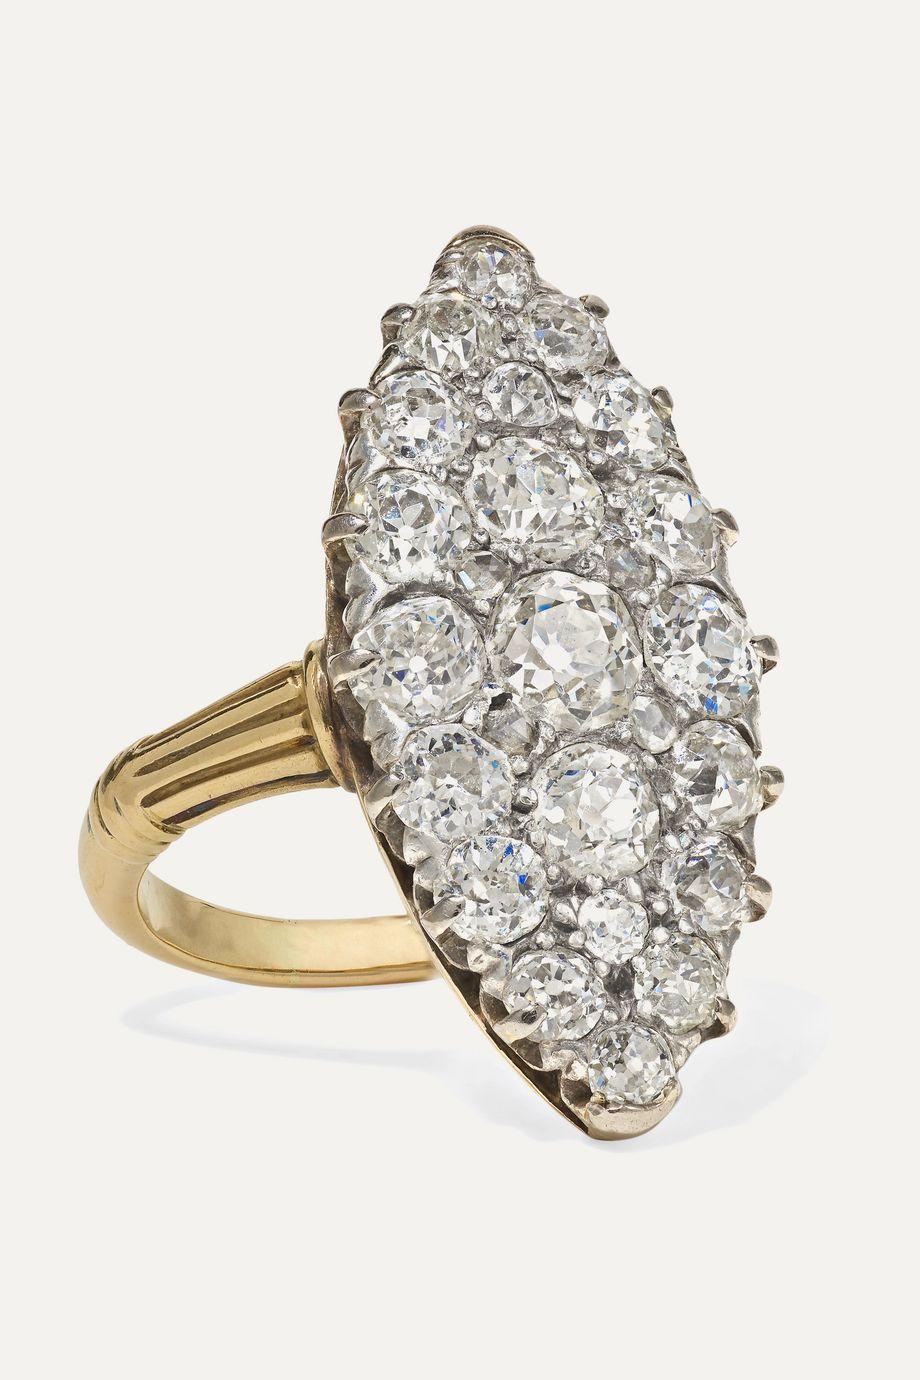 Fred Leighton 1900s 18-karat gold, silver and diamond ring